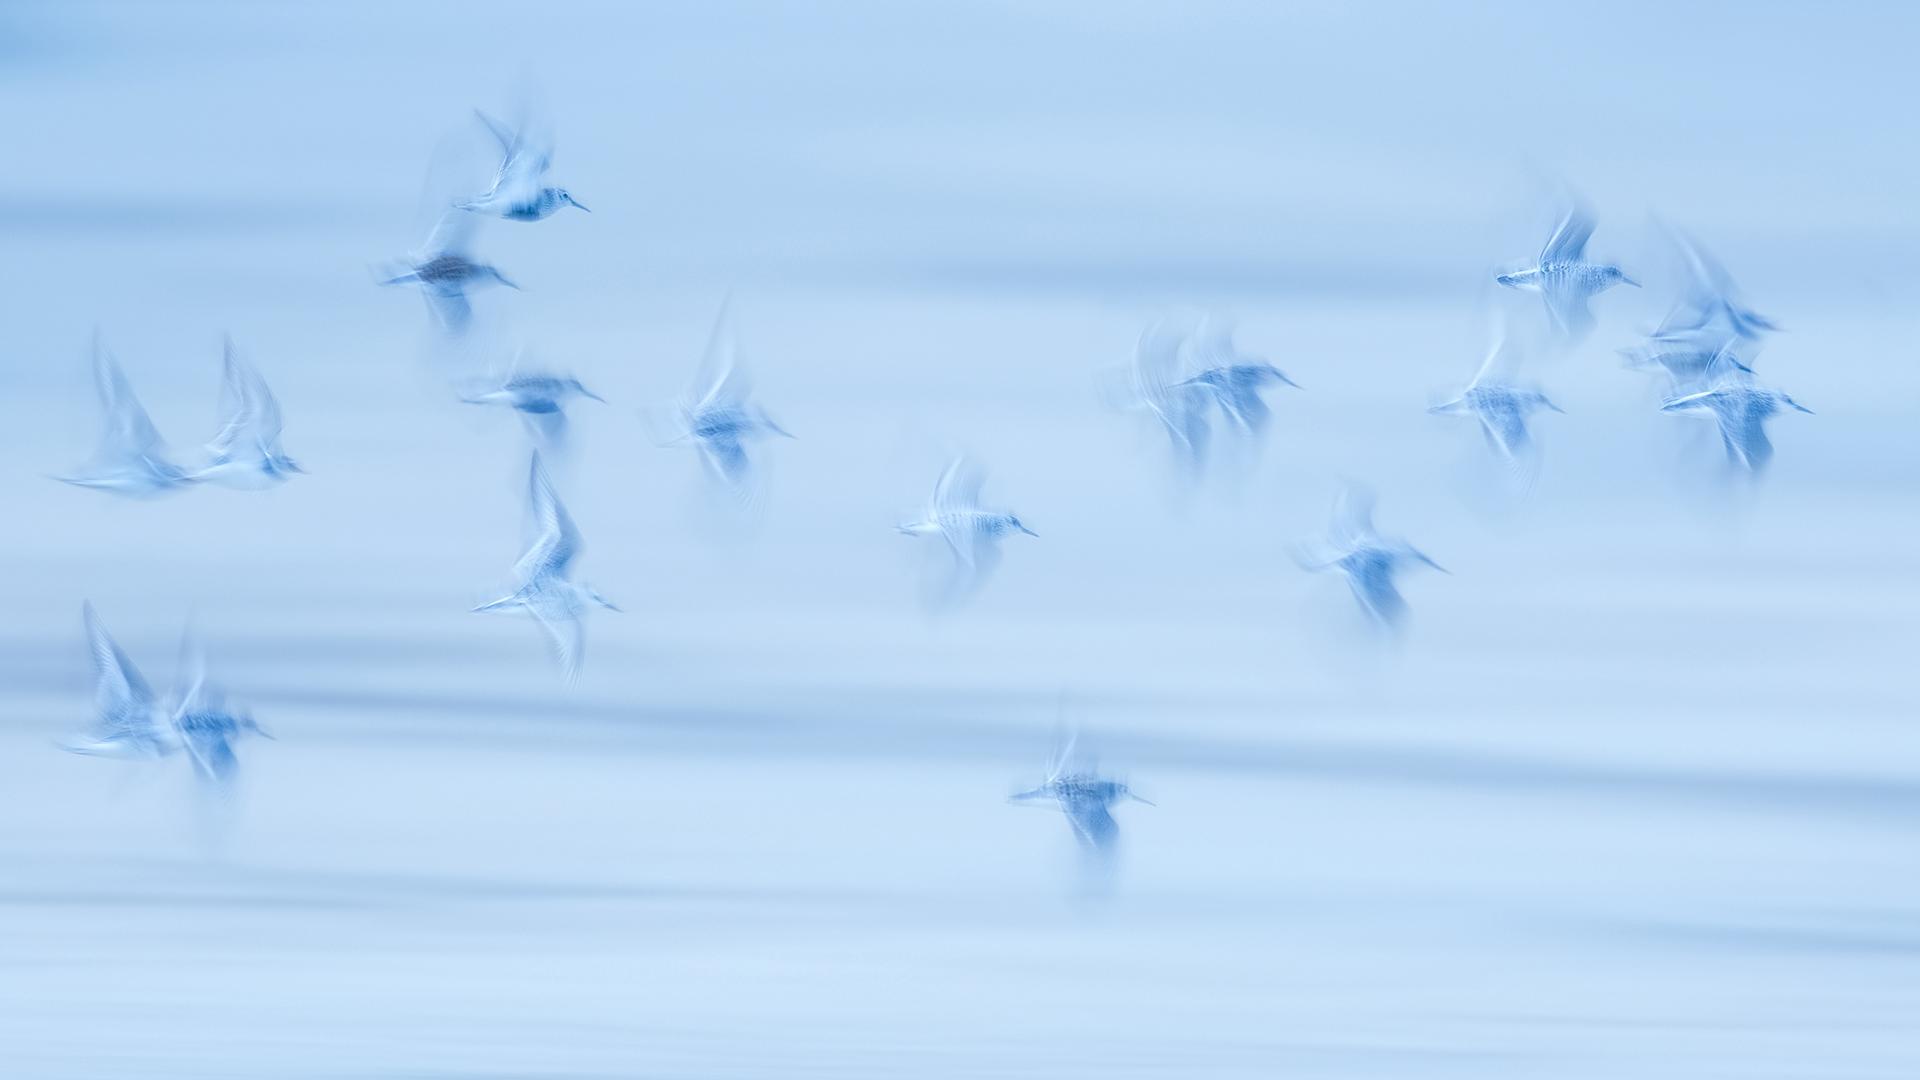 Together - Mario Suarez - Portfolio Natural, Fotografía de Naturaleza de Autor